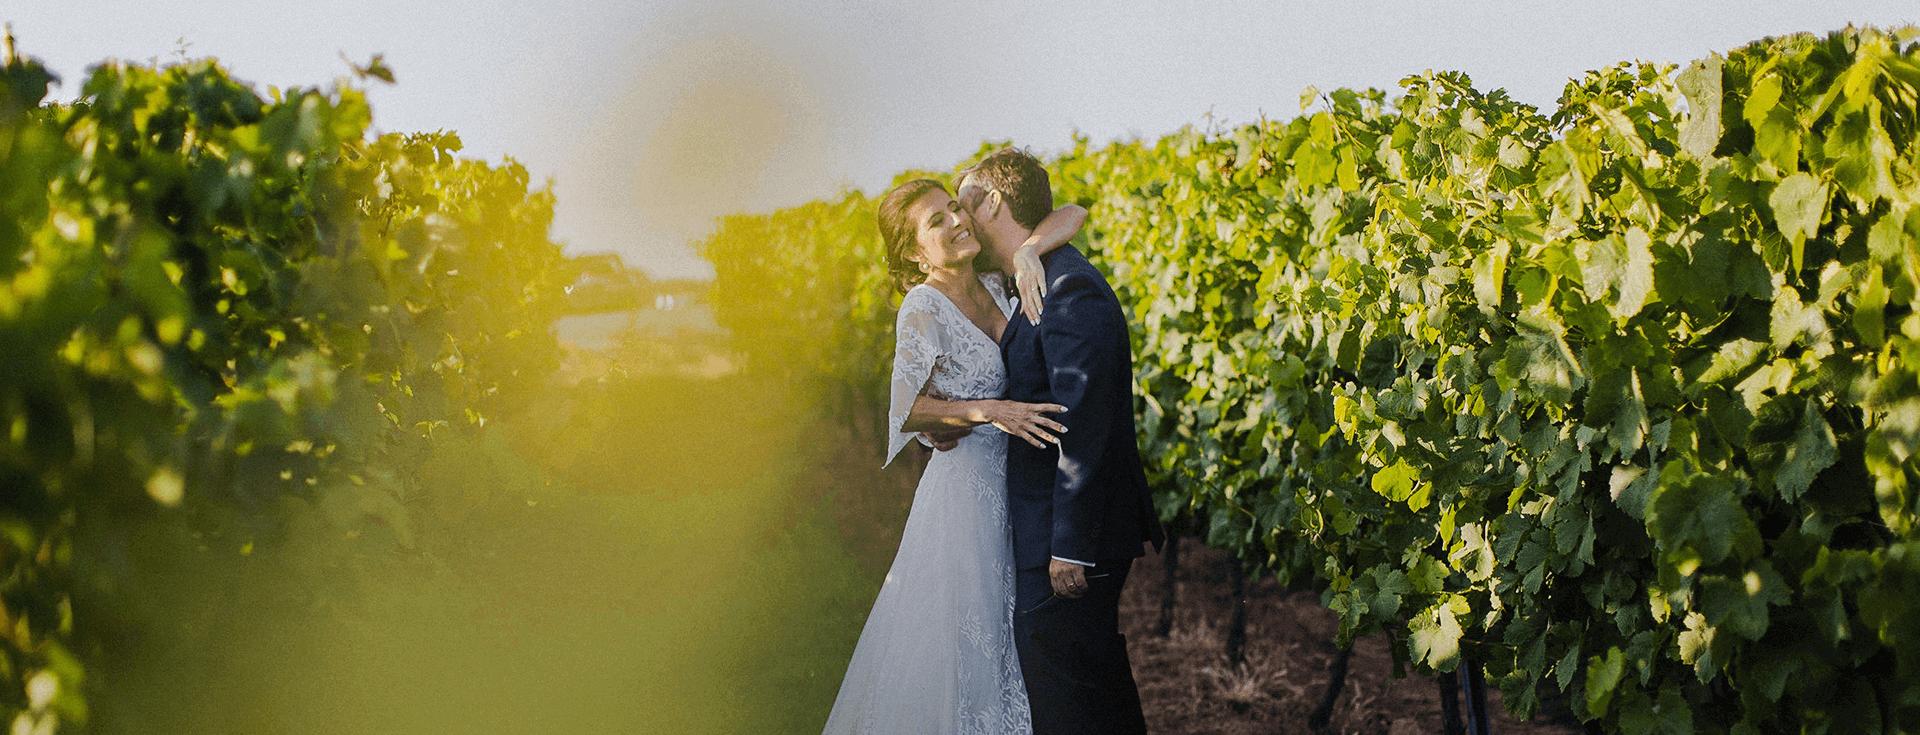 Wedding - Bride and Groom - Quinta do Gradil Vineyard